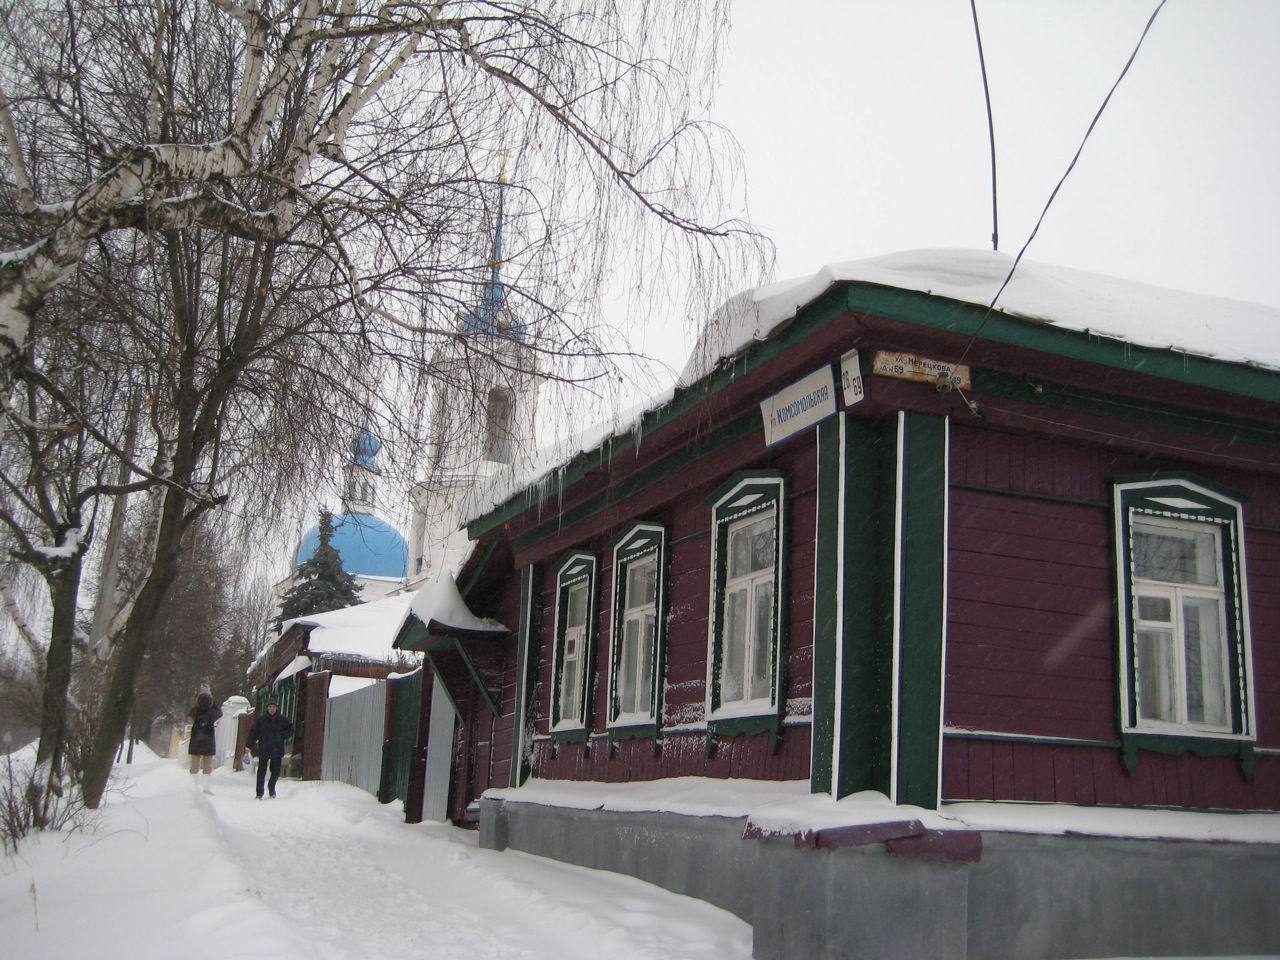 snowy-street-corner